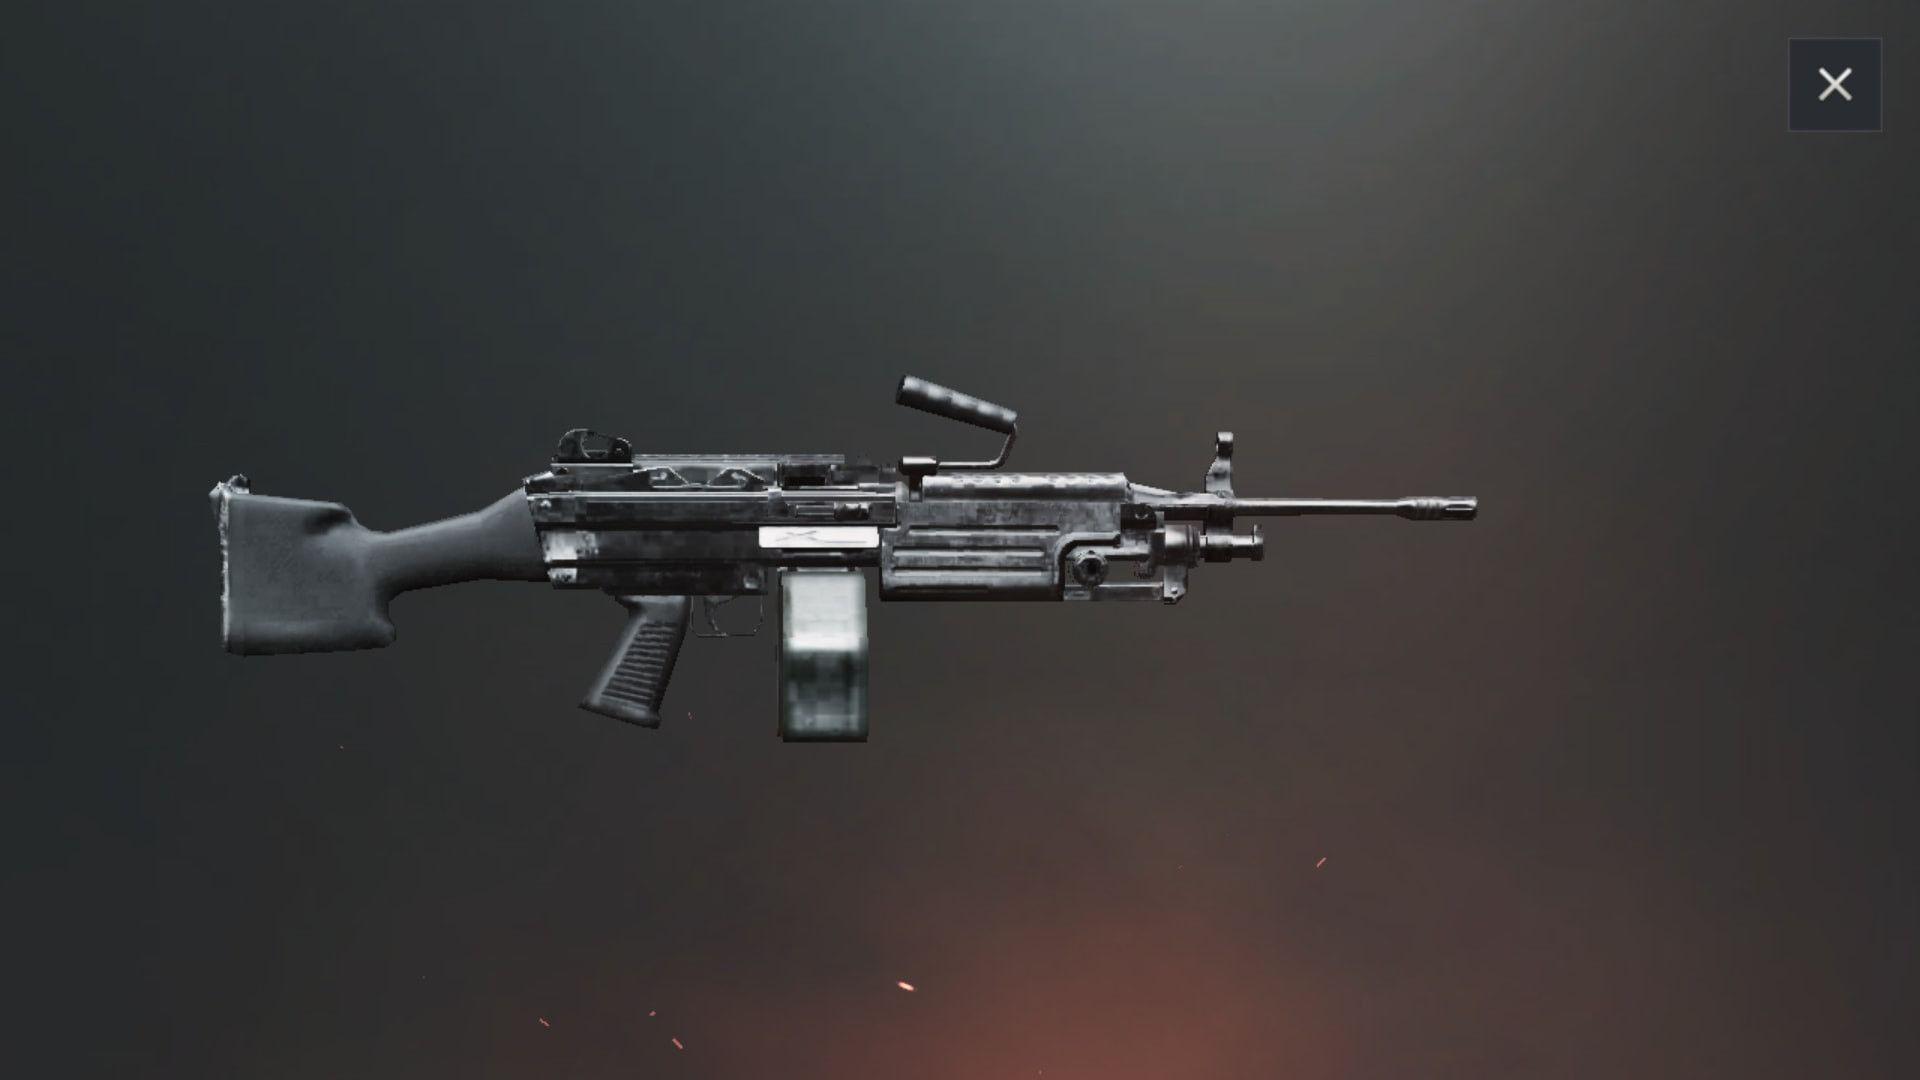 pubg gun m249، خلفيات pubg، تنزيل pub g